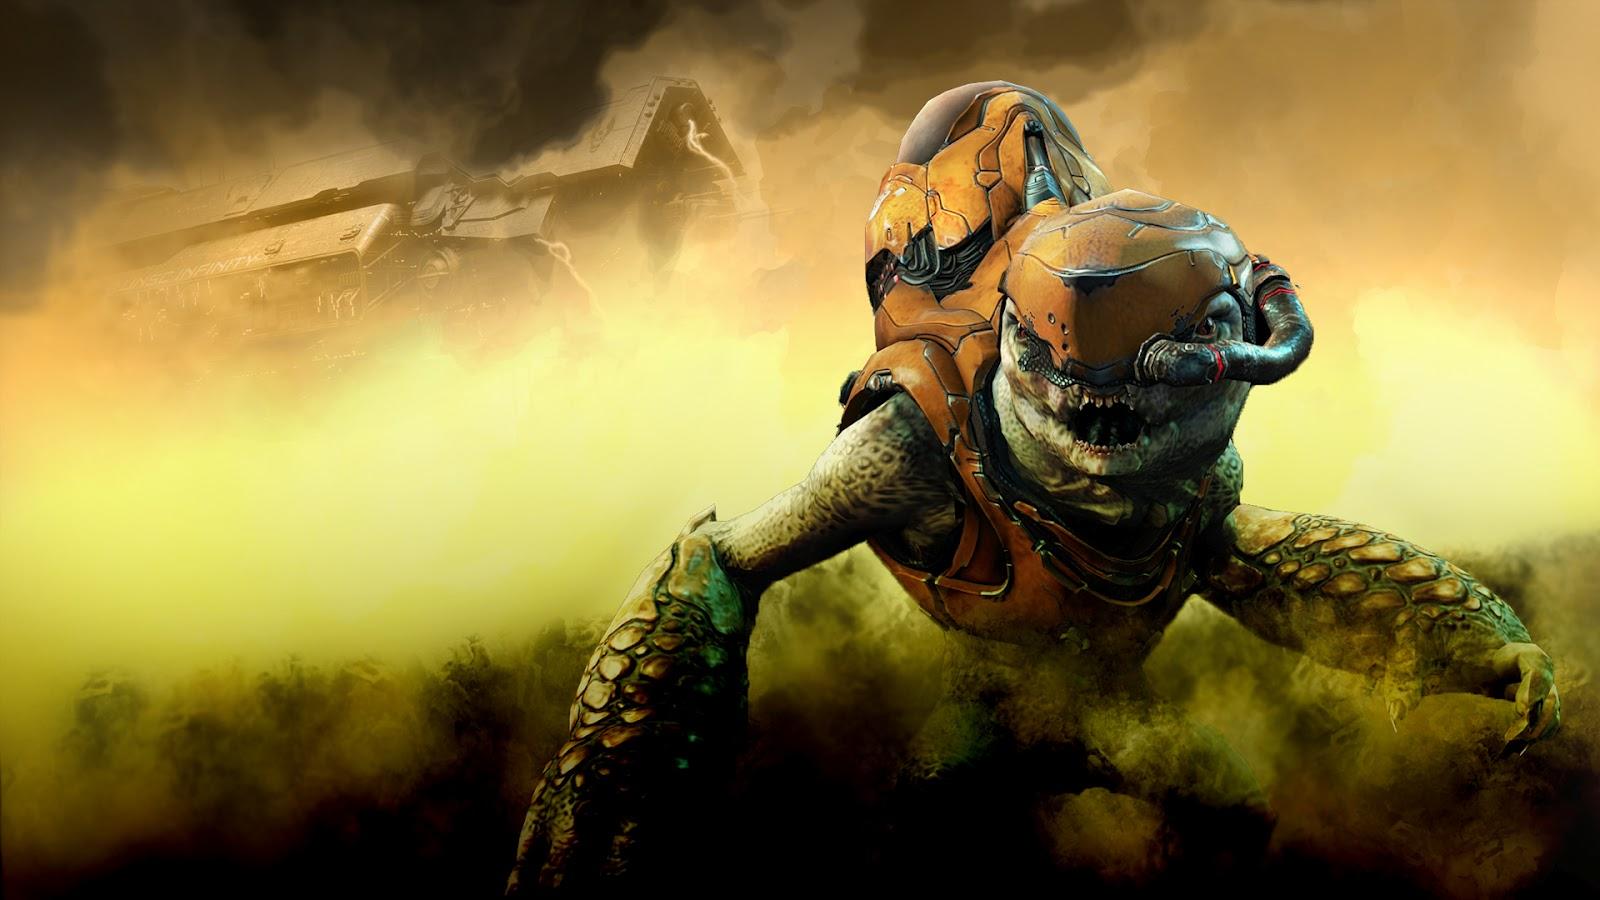 Cool Halo 4 Wallpapers WallpaperSafari